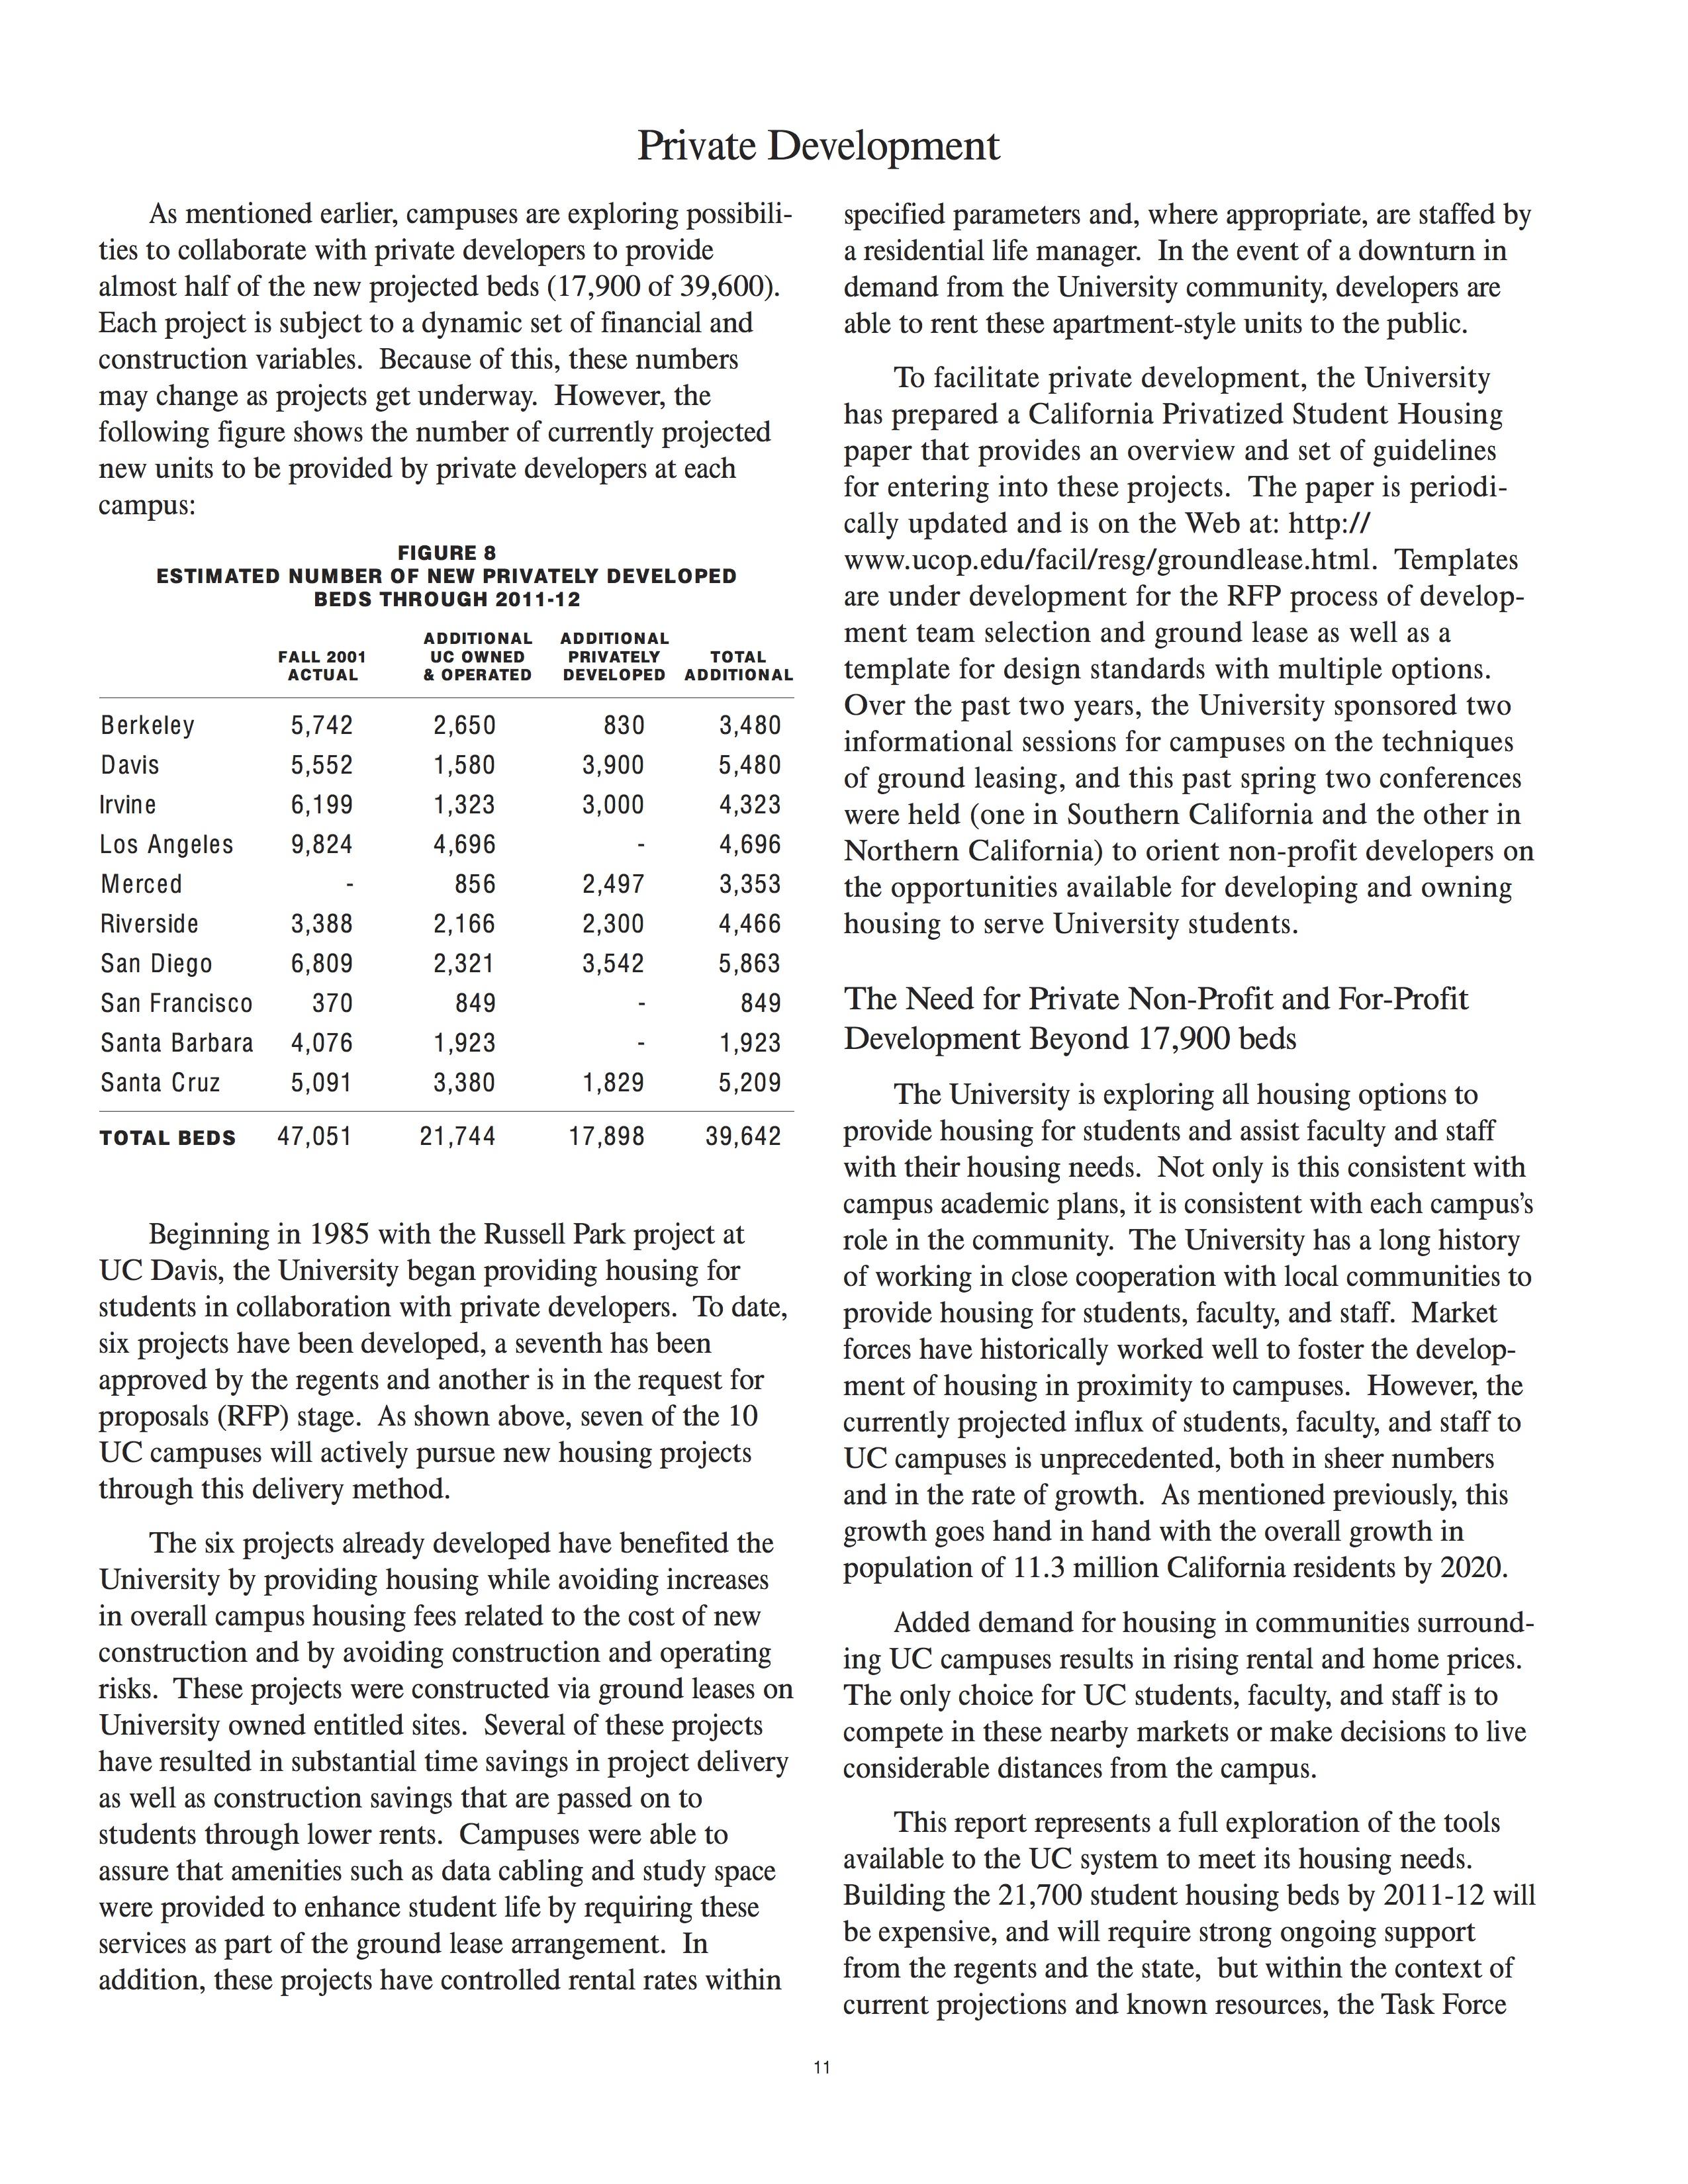 UC Housing in the 21st Century - Public-Private Split